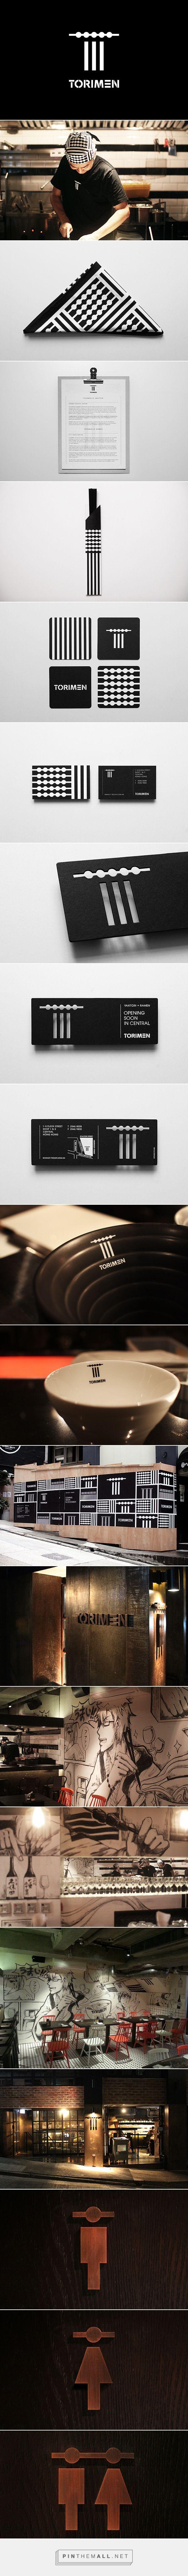 Japanese Yakitori & Ramen restaurant identity - TorimenArt and design inspiration from around the world – CreativeRoots - created via https://pinthemall.net